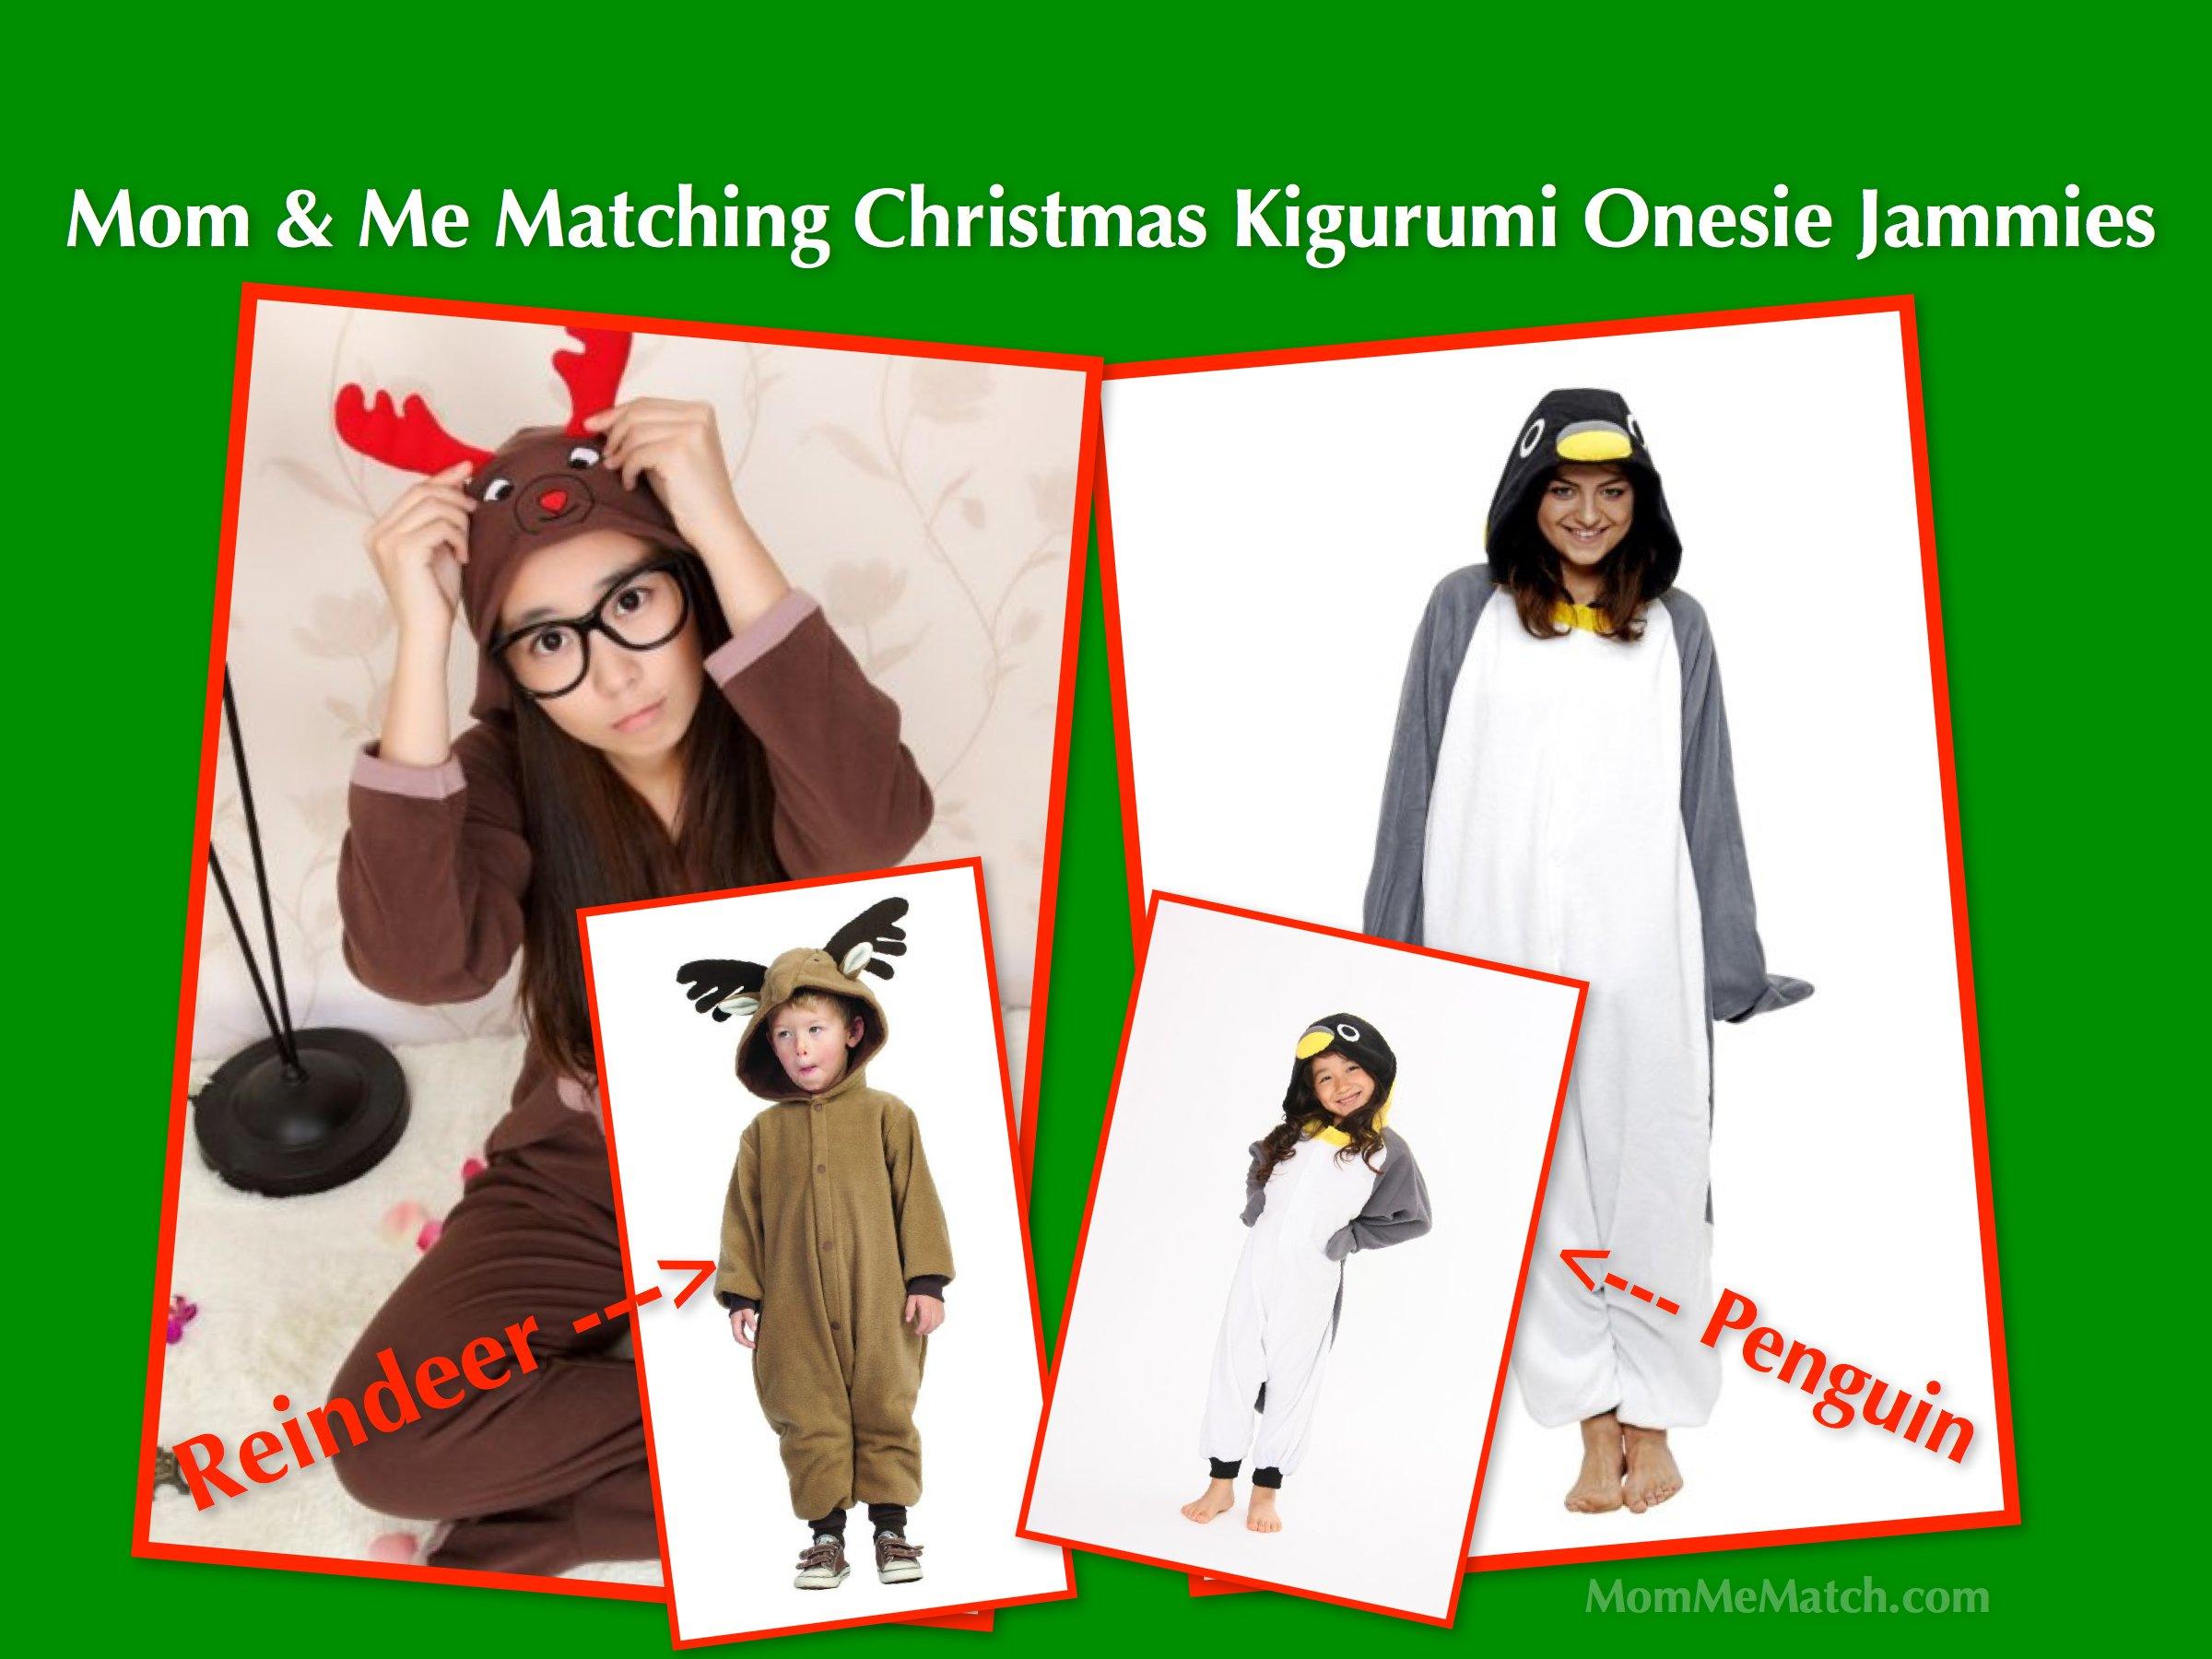 Mom & Me Matching Christmas Kigurumi Onesie Jammies